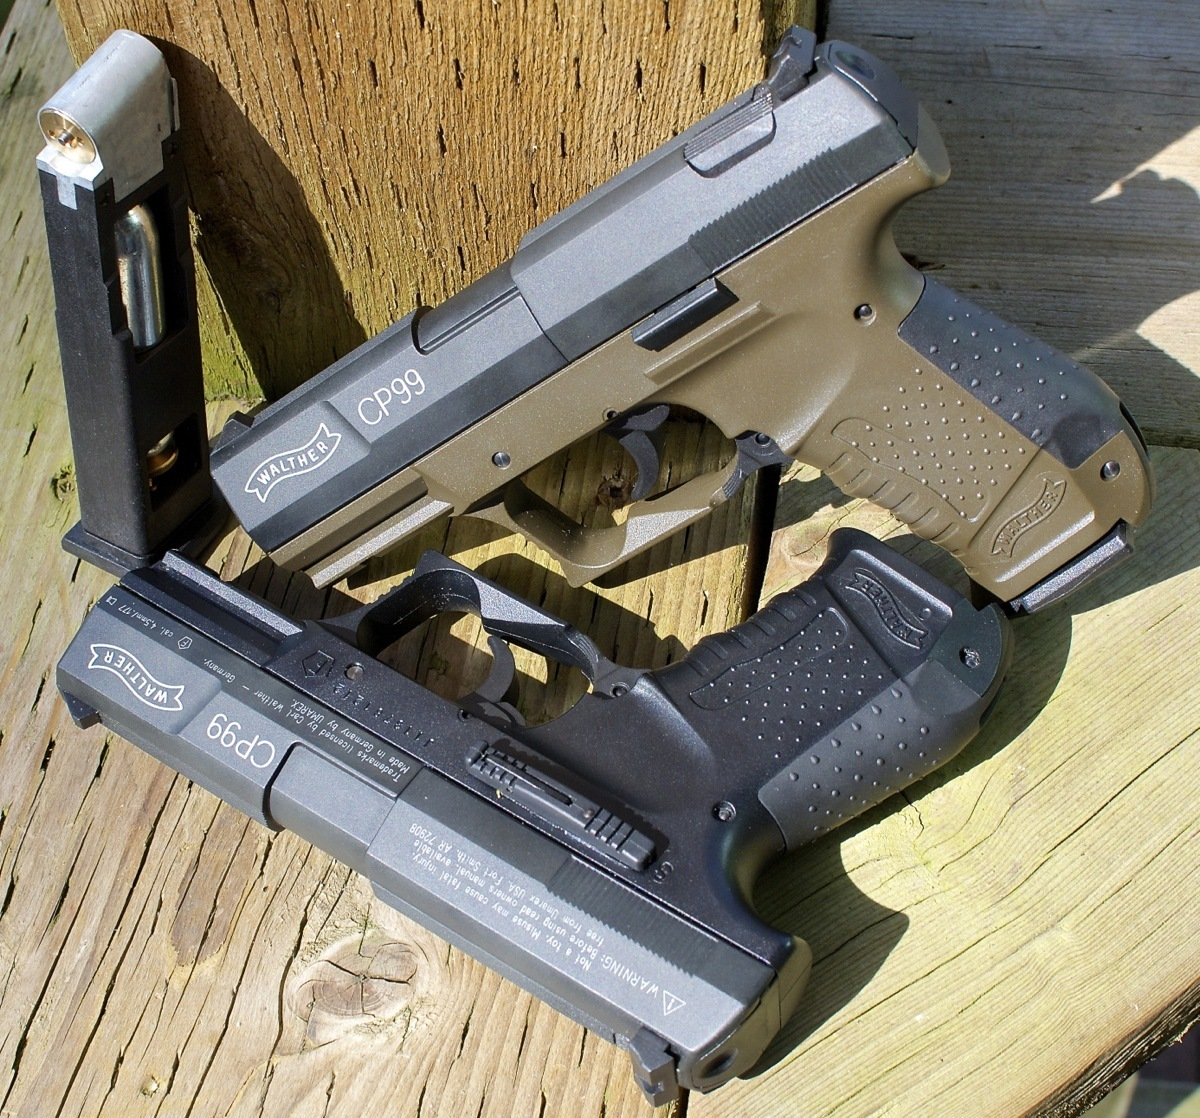 Walther CP99 Pellet Air Pistol - Black